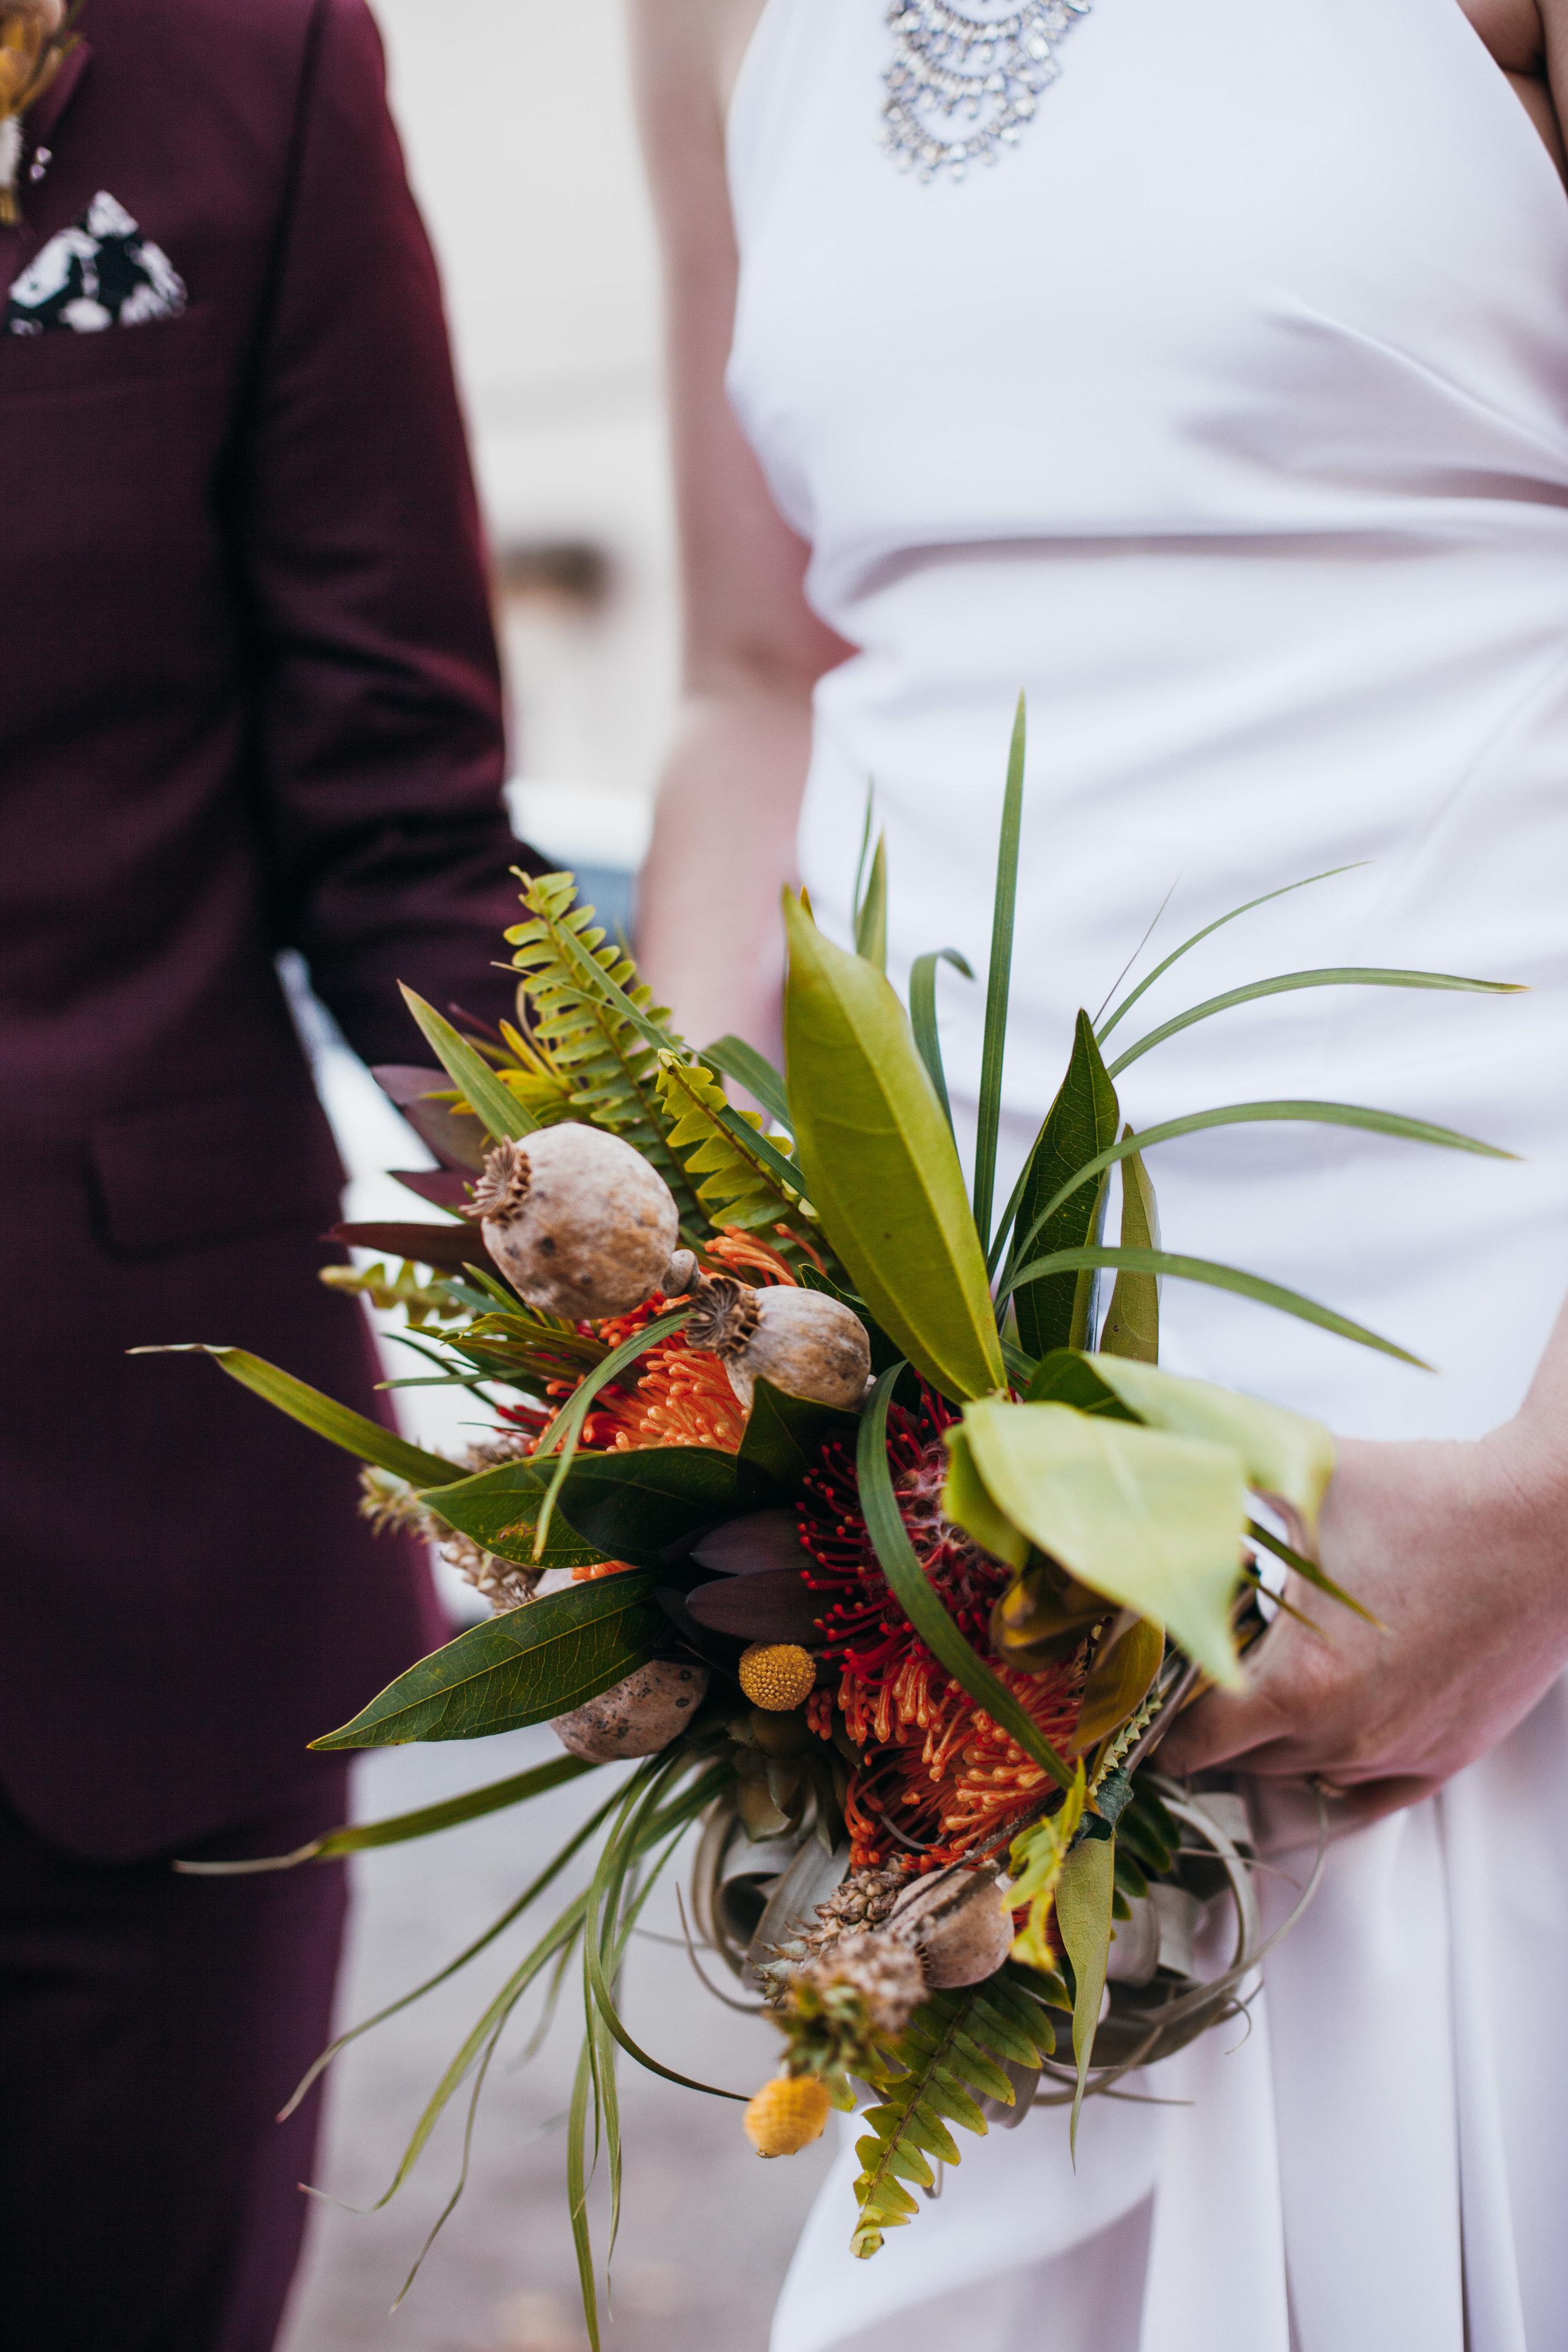 julia-hembree-photography-eden-village-church-wedding-savannah-warehouse-wedding-ivory-and-beau-bridal-boutique-savannah-florist-savannah-wedding-planner-savannah-event-design-scad-wedding-artist-wedding-savannah-funky-wedding-handmade-wedding-23.jpg